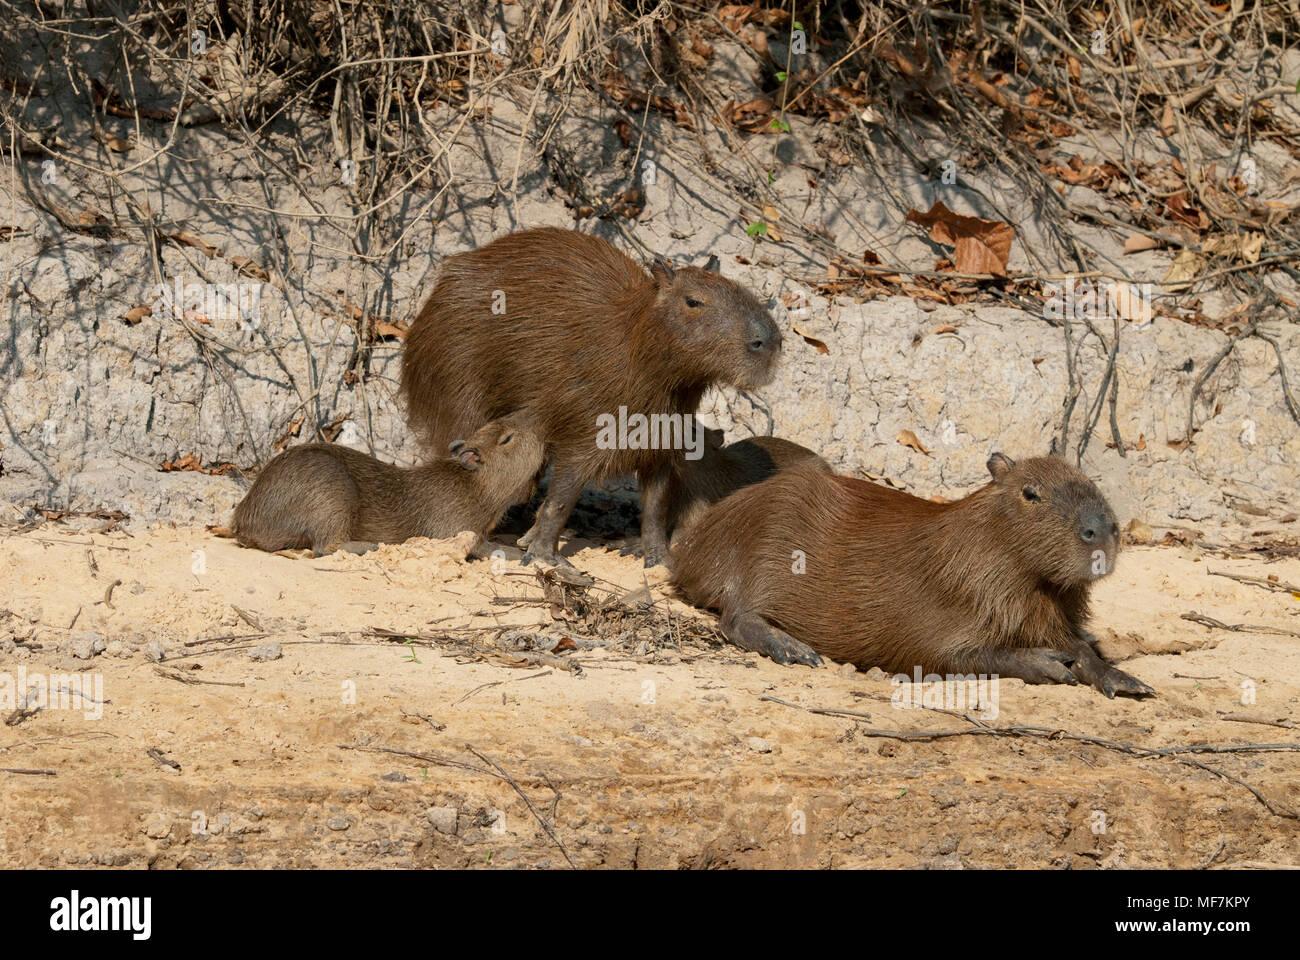 Capybara family in the Pantanal in southern Brazil; young capybara nursing - Stock Image